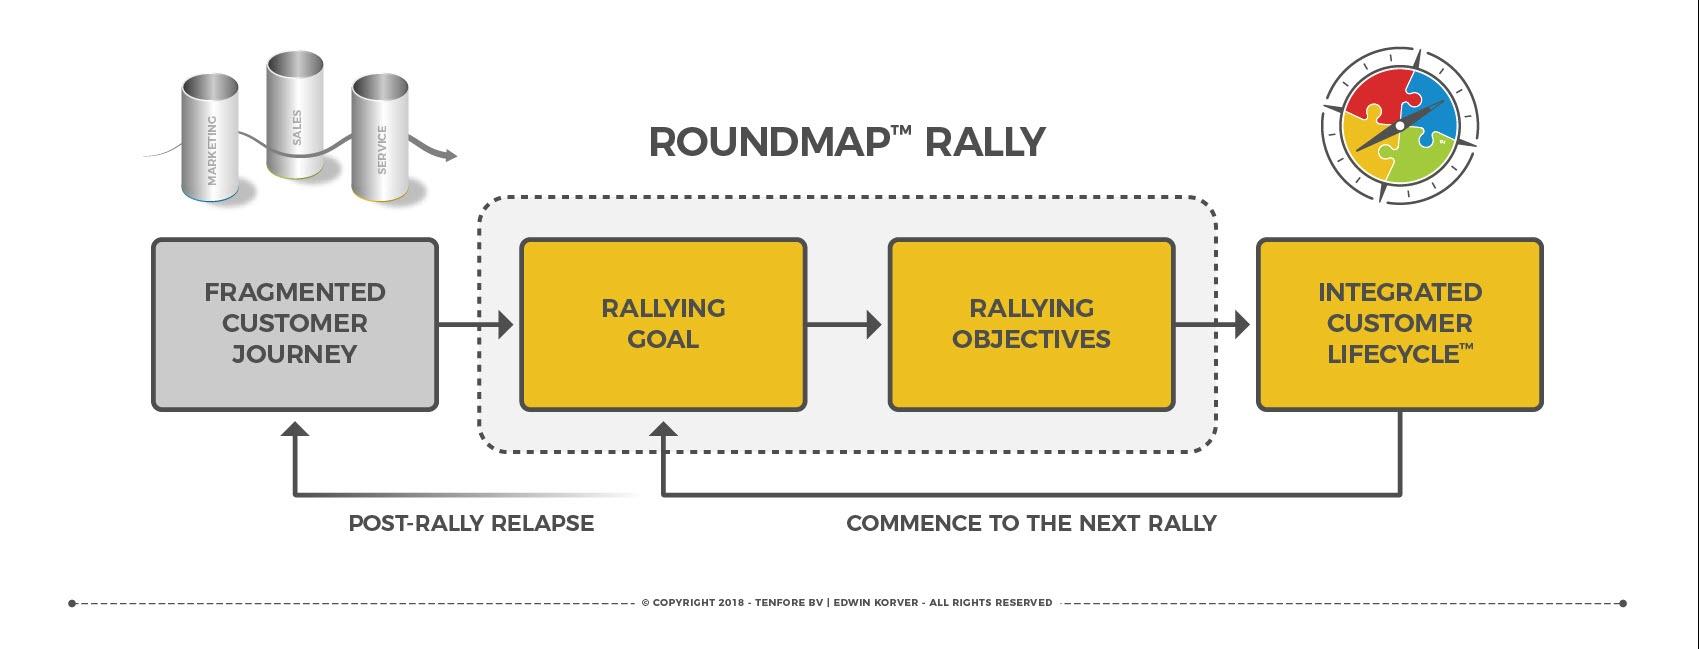 ROUNDMAP™ Rally